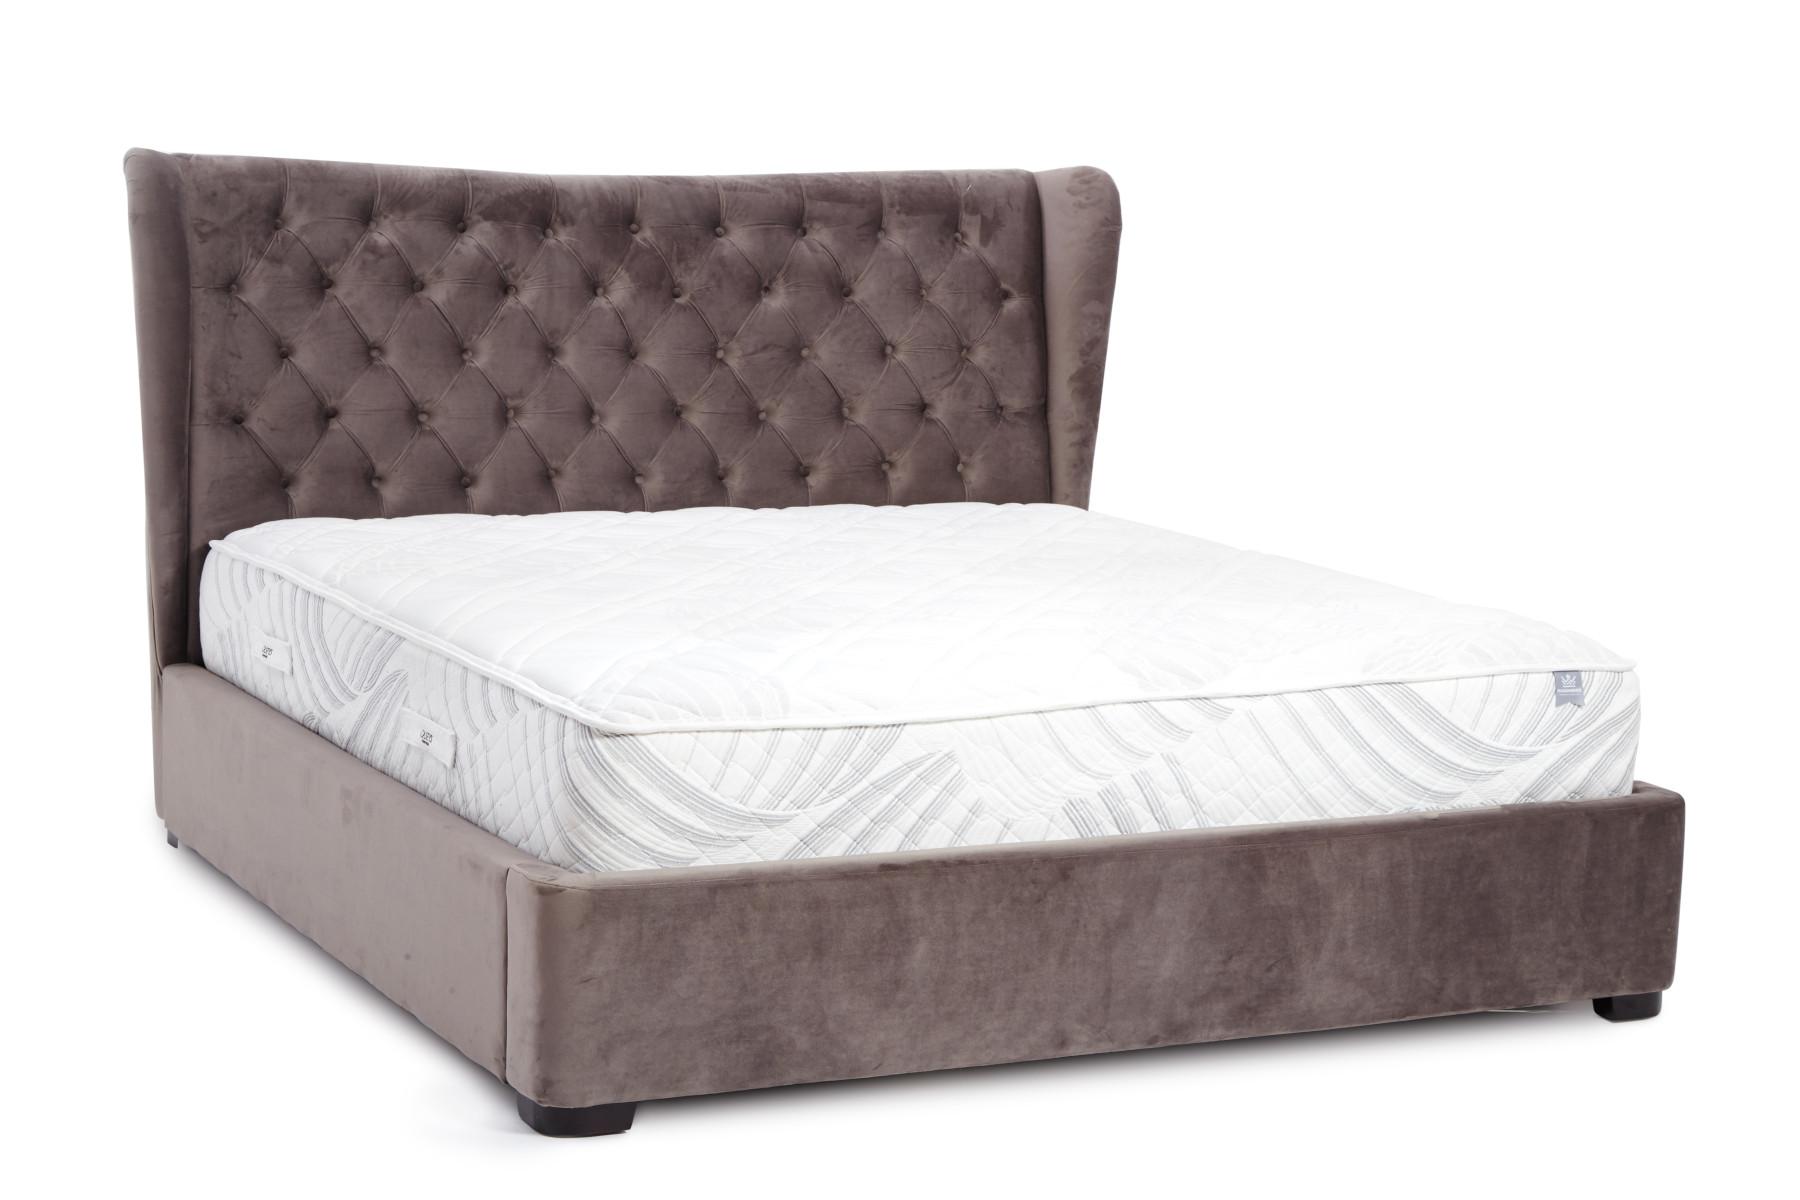 Hobart Ottoman Bed Frame